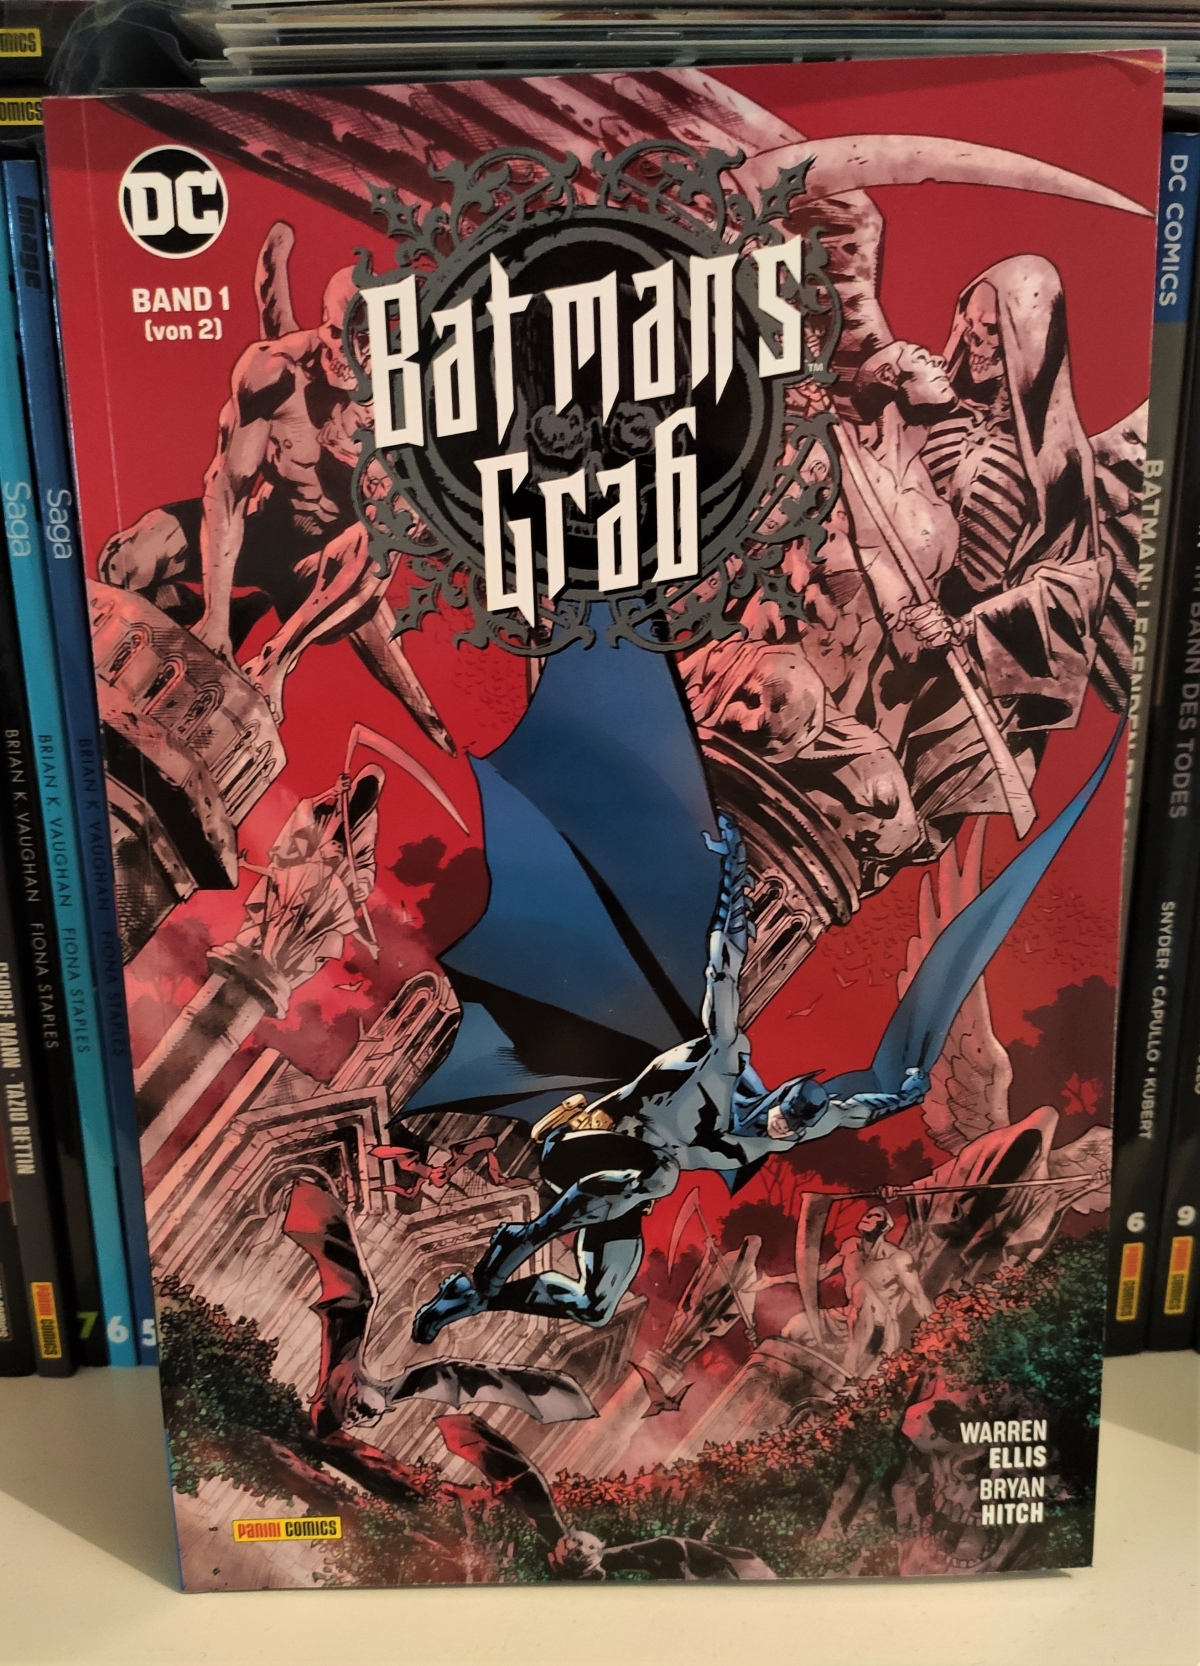 Nerd.Ics liest … Batmans Grab Bd. 1 |Review